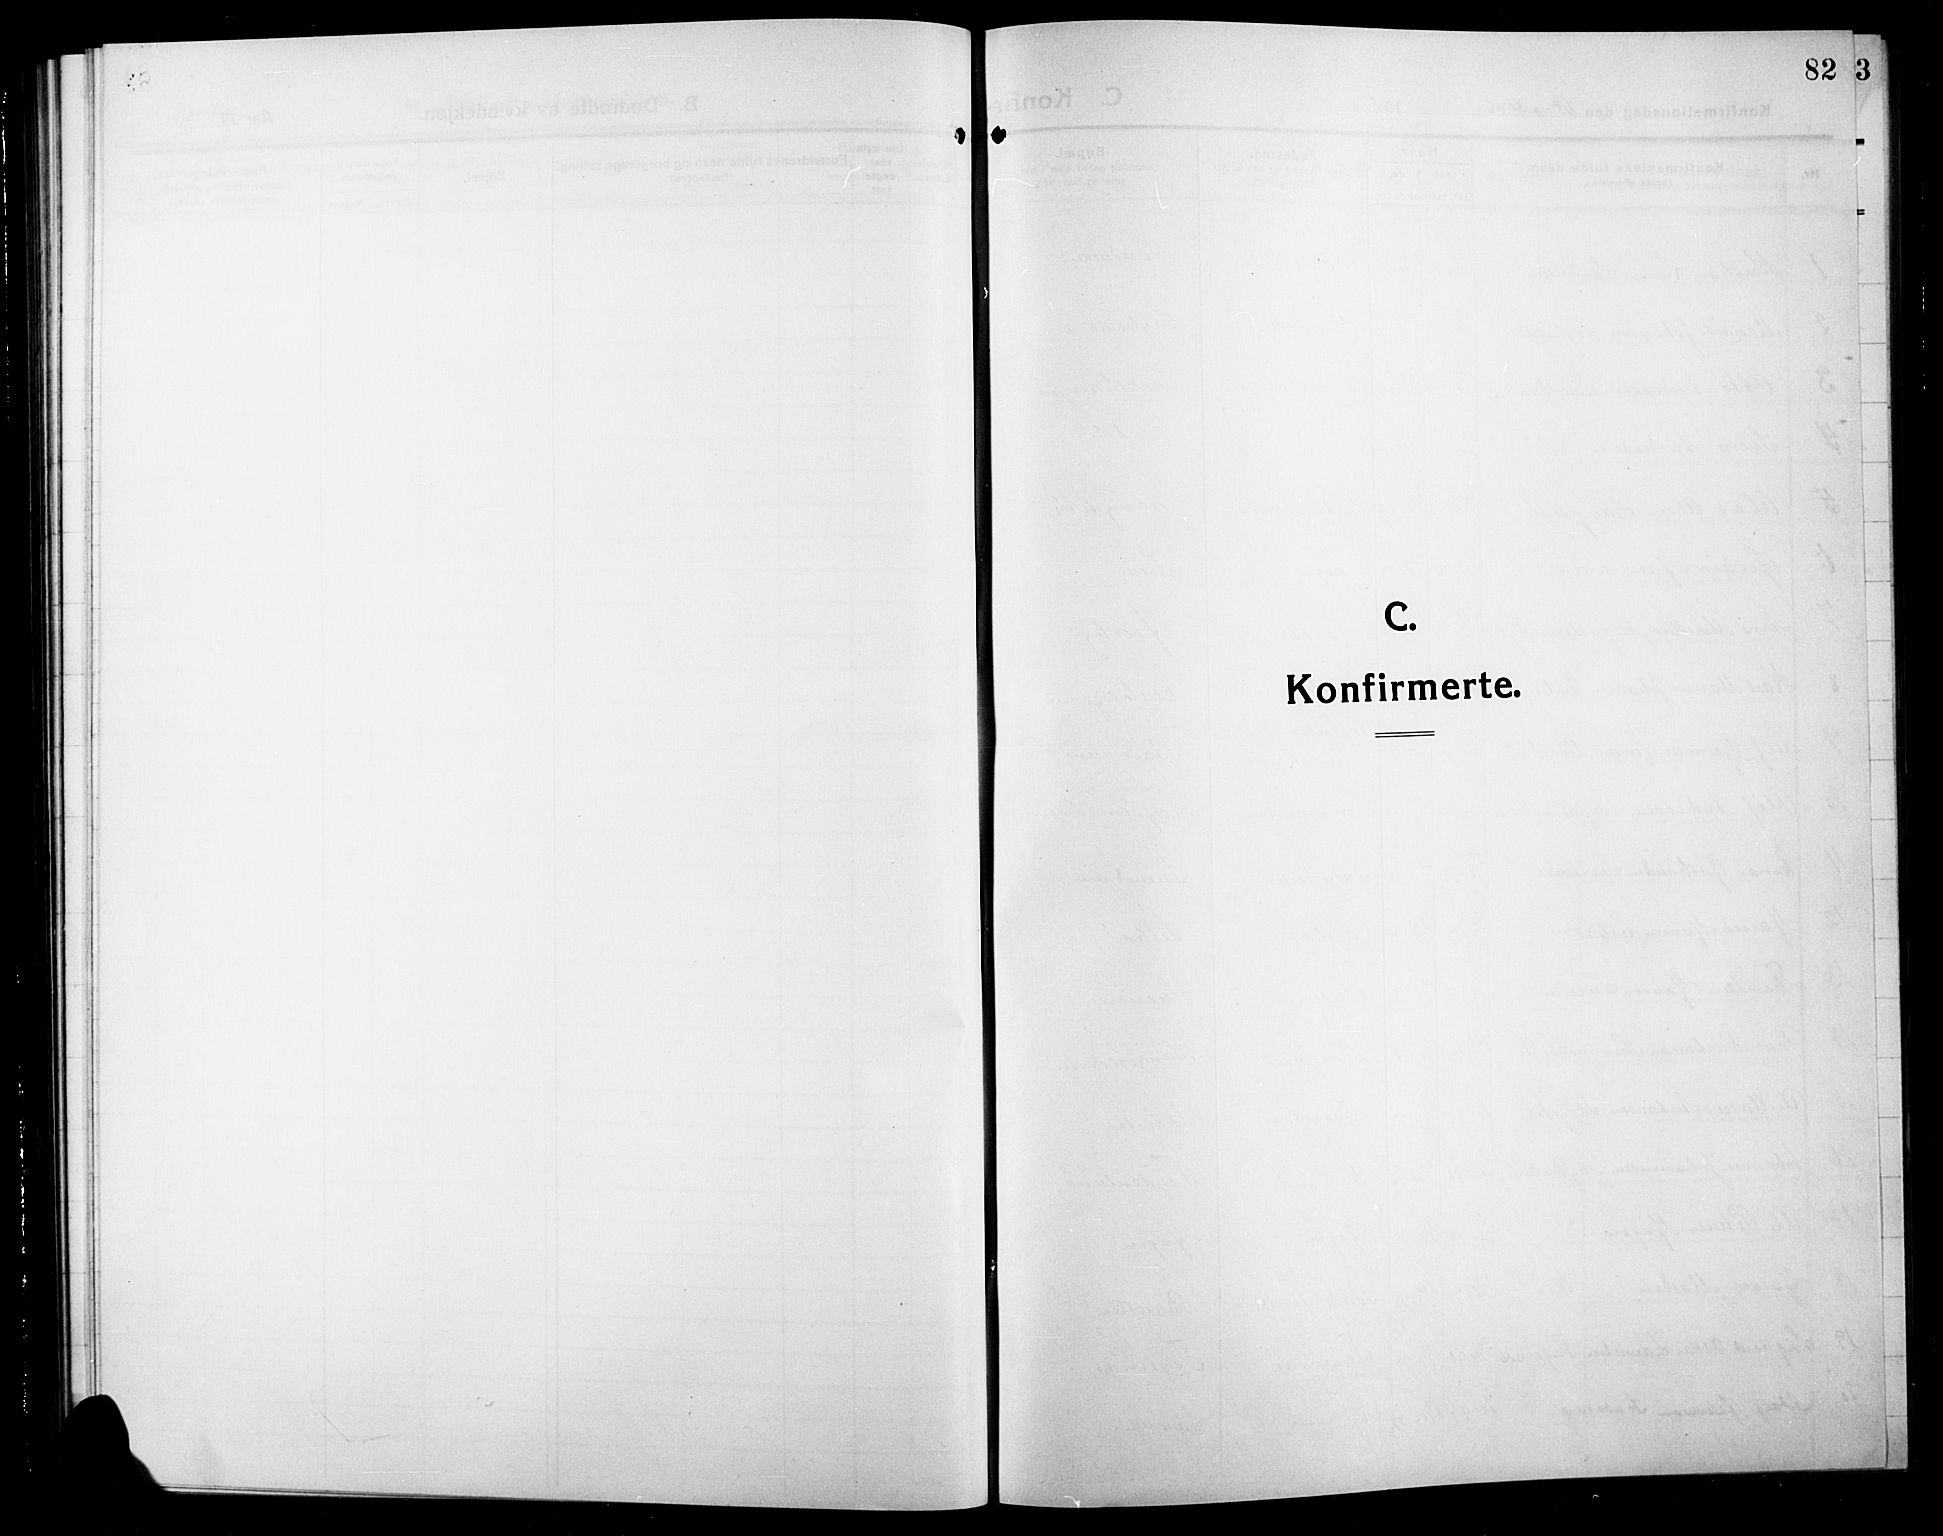 SAH, Søndre Land prestekontor, L/L0006: Klokkerbok nr. 6, 1912-1925, s. 82